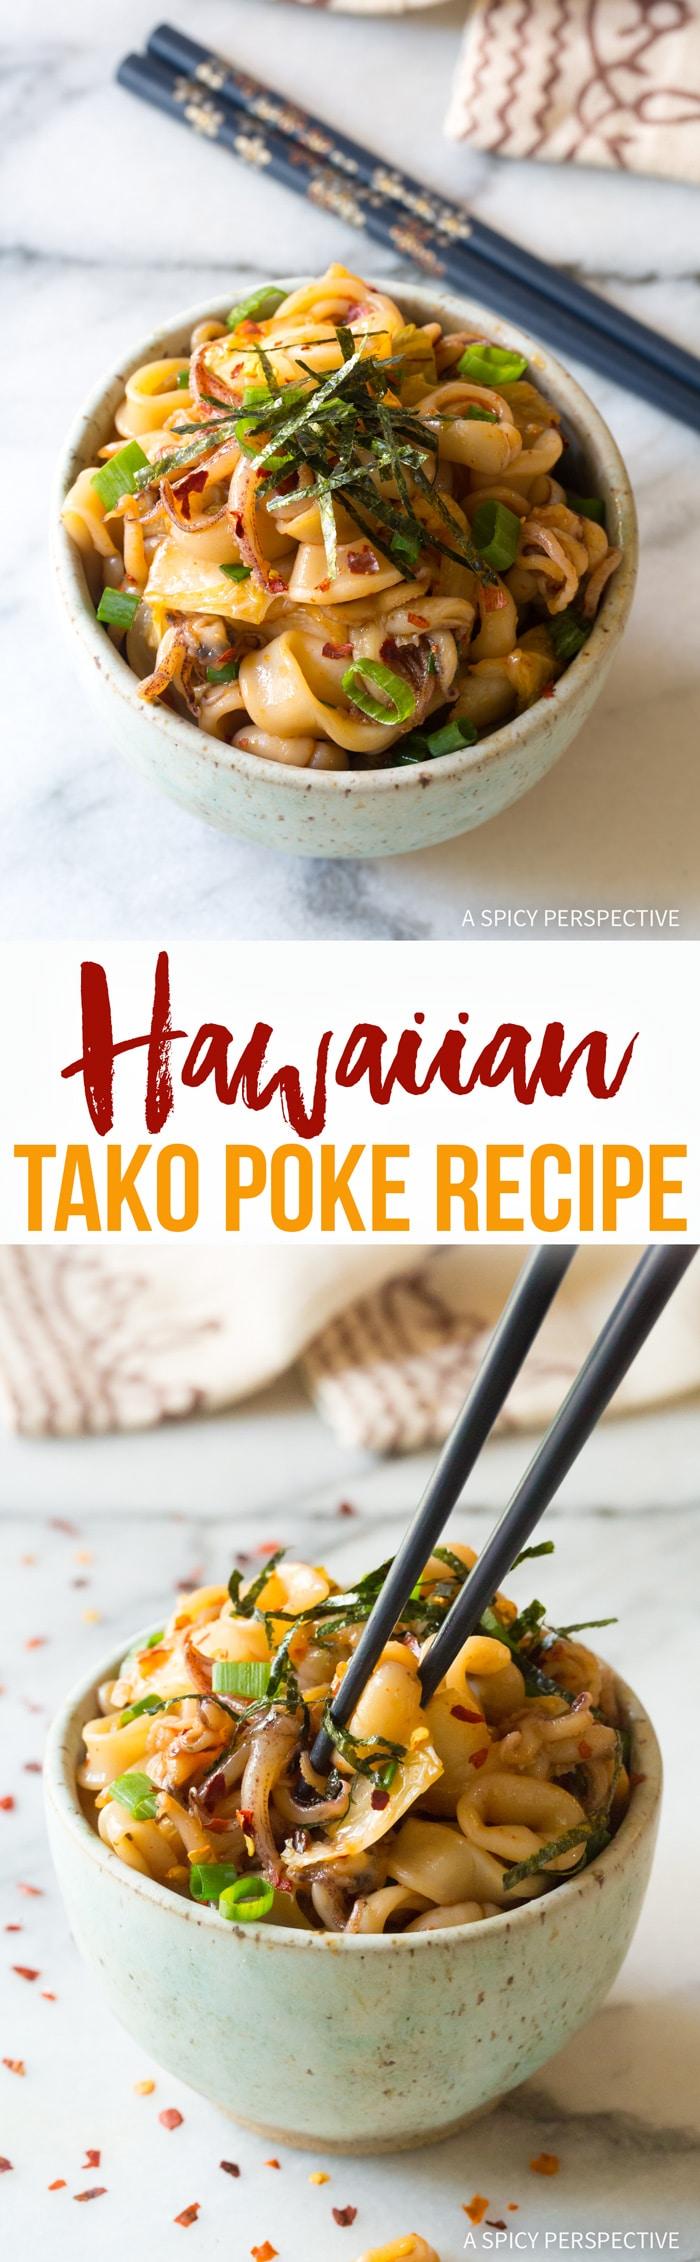 Amazing Hawaiian Tako Poke Recipe (Octopus or Squid!)